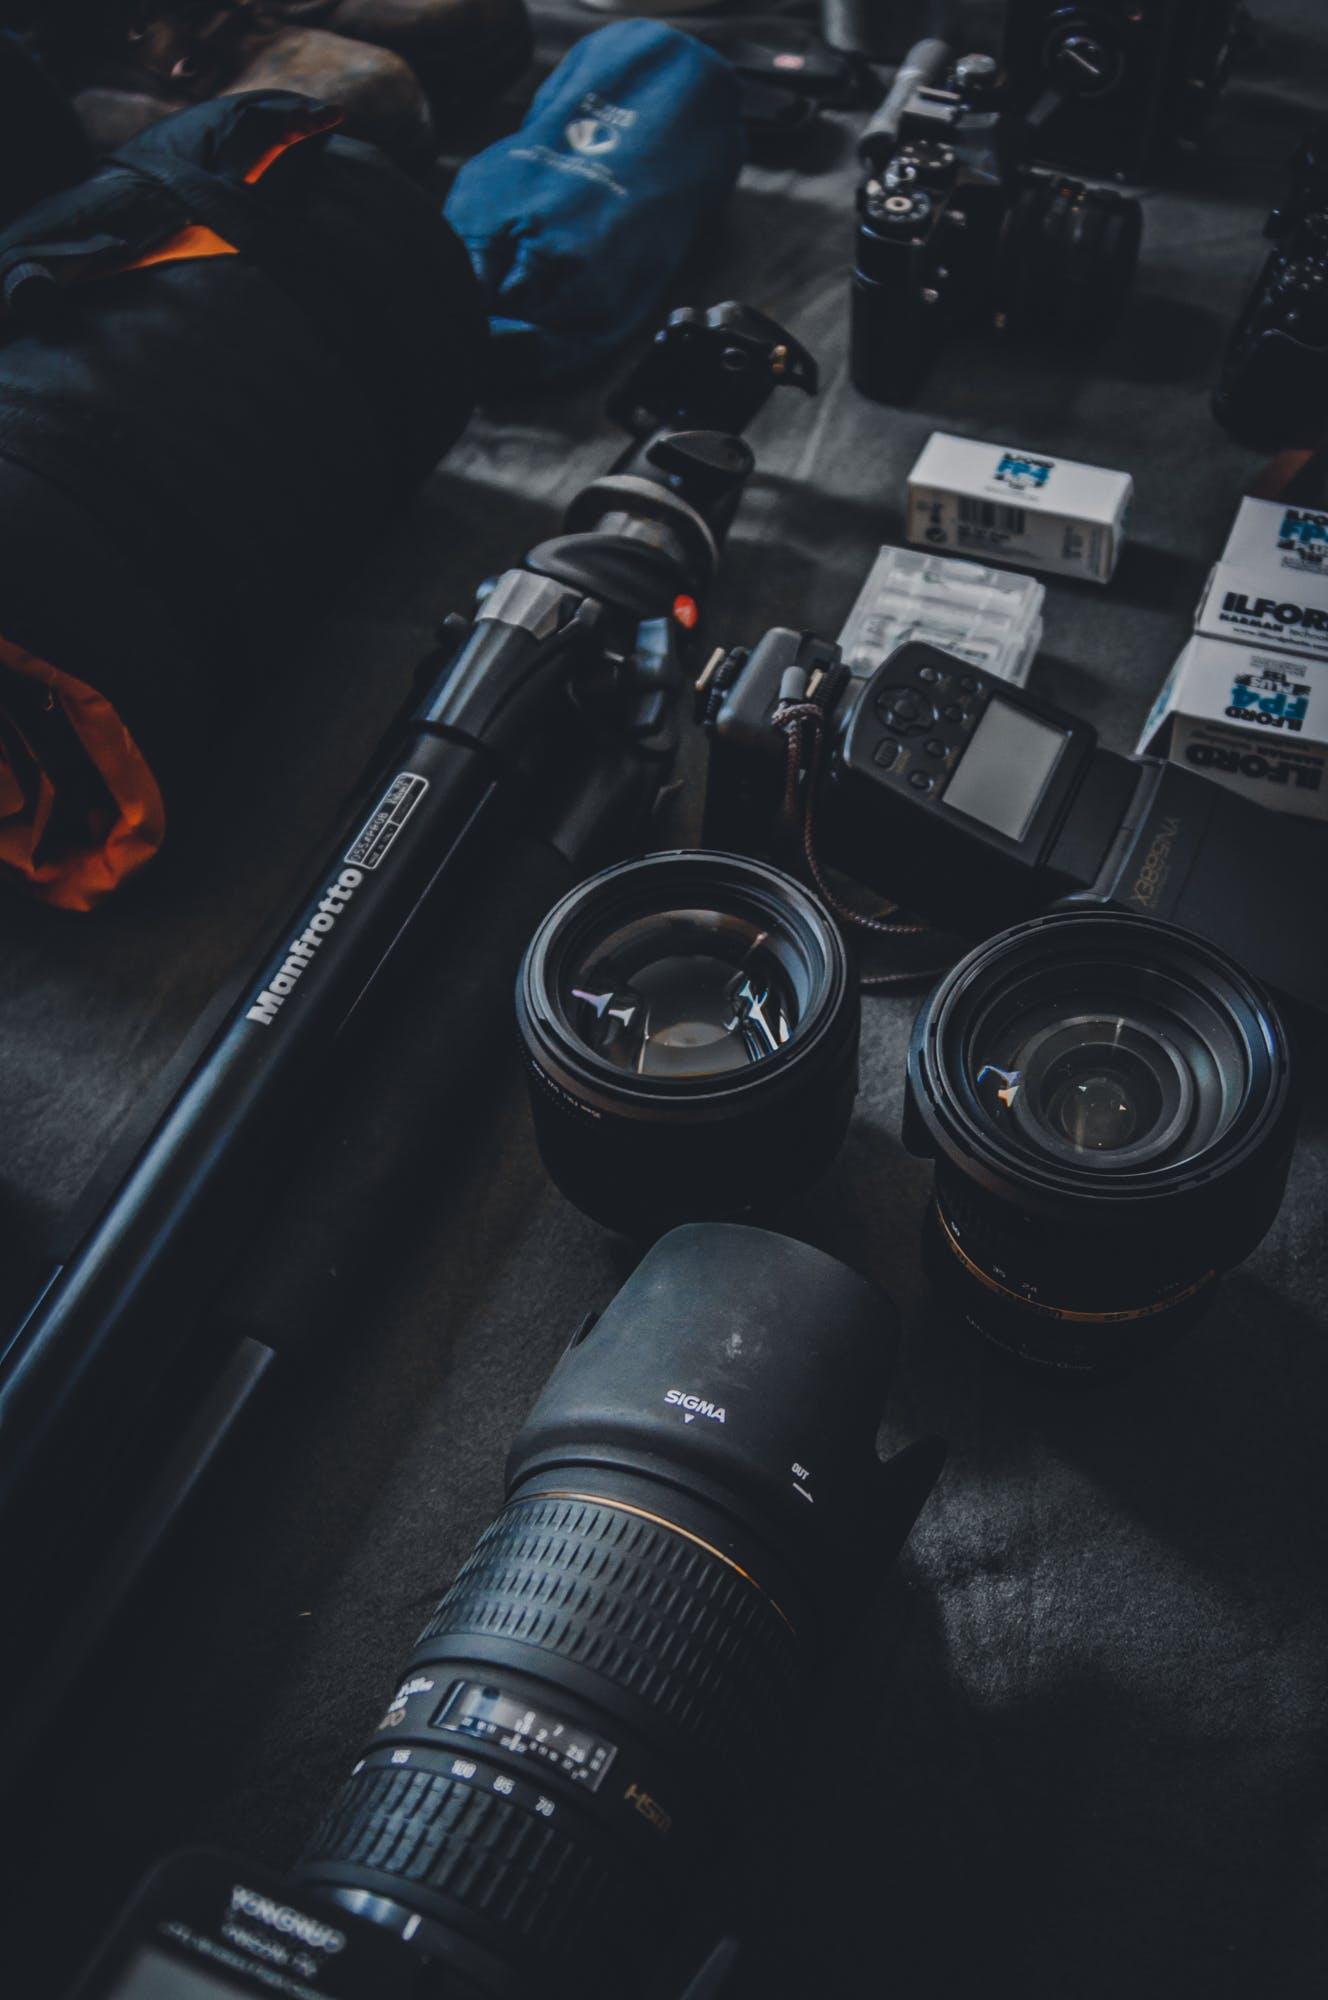 Free stock photo of camera, photography, technology, lens